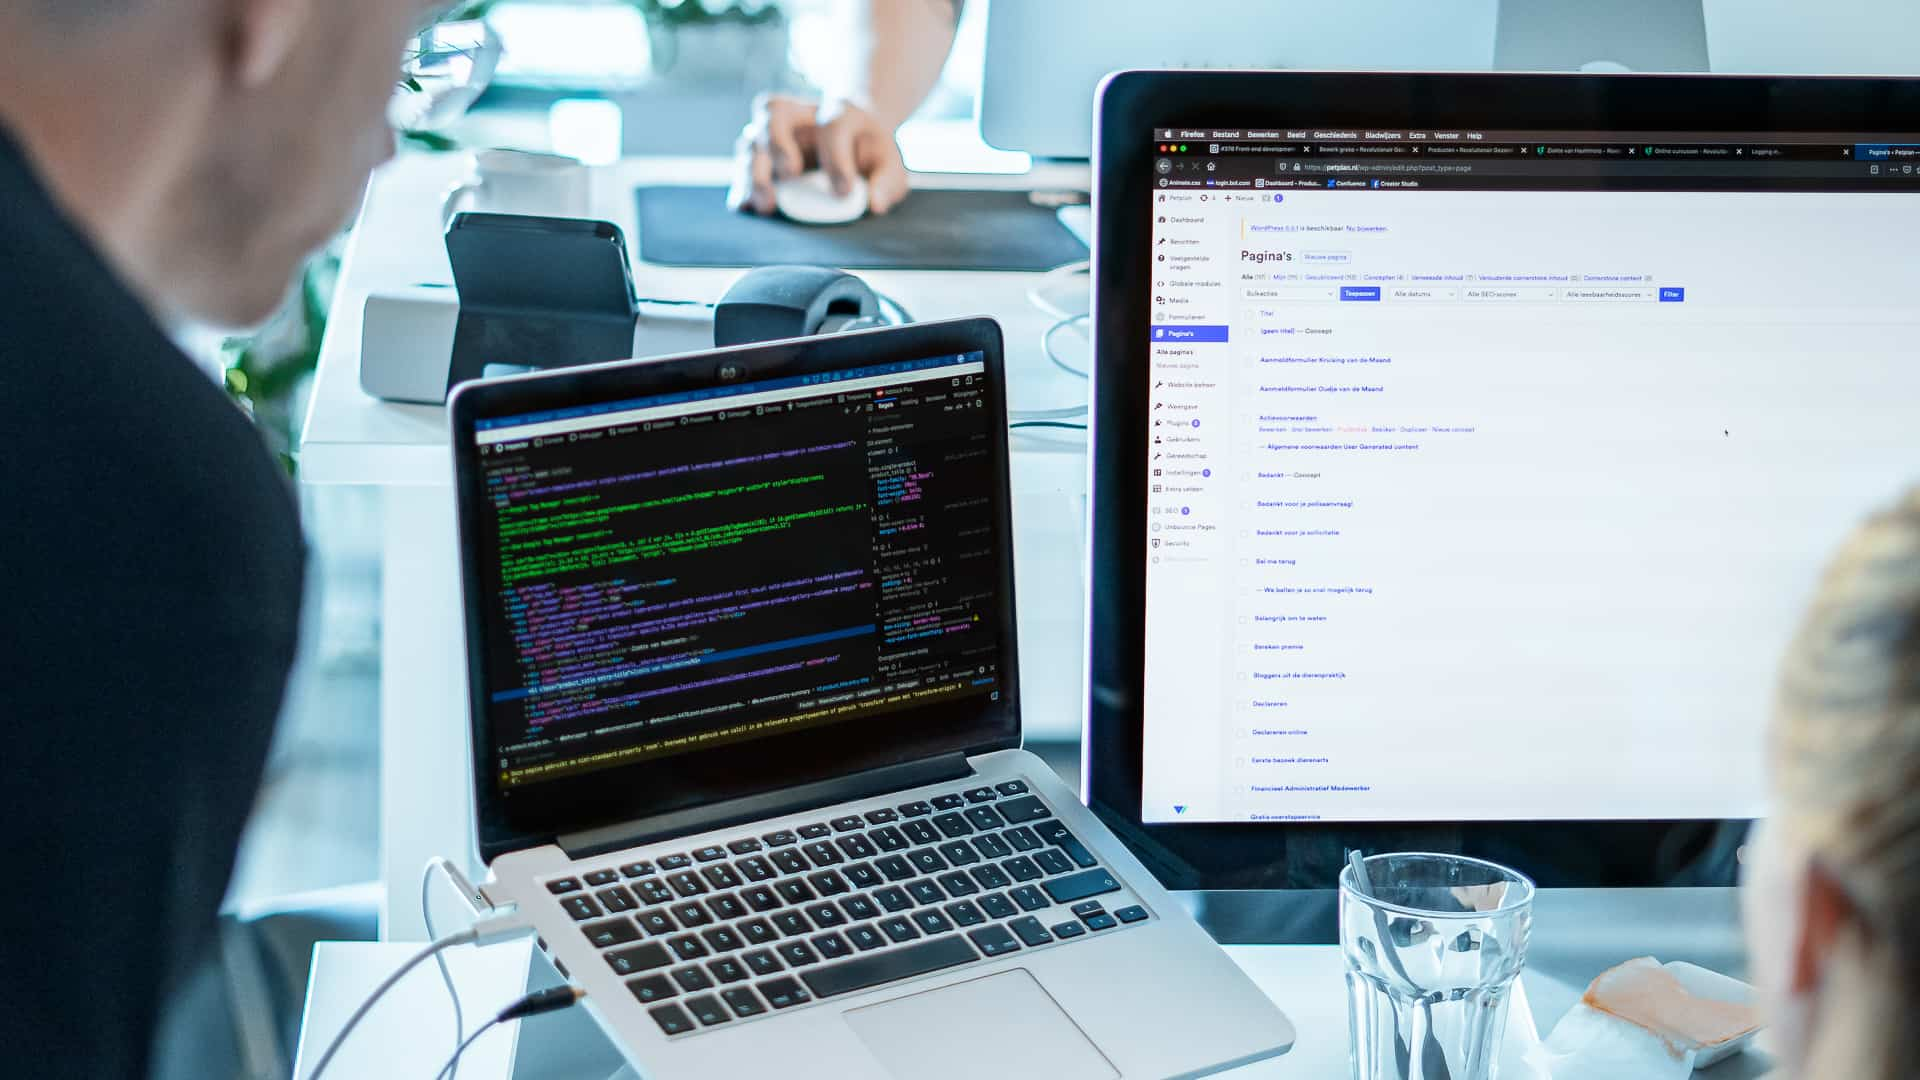 Case - Petplan - WordPress development